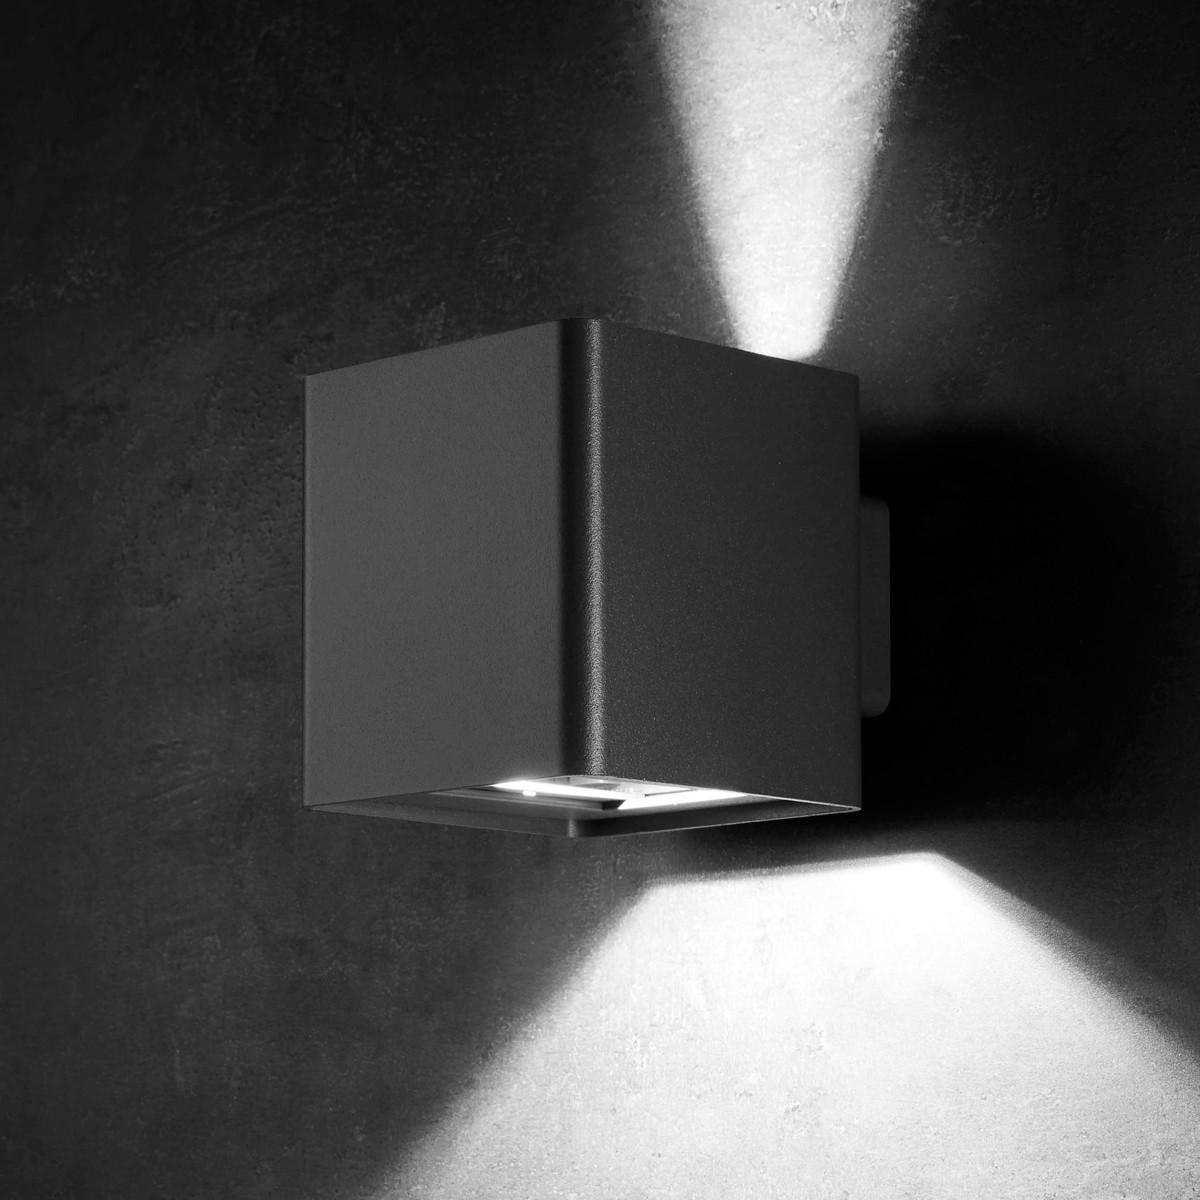 Lupia Licht Ouverture LED Außenwandleuchte, anthrazit